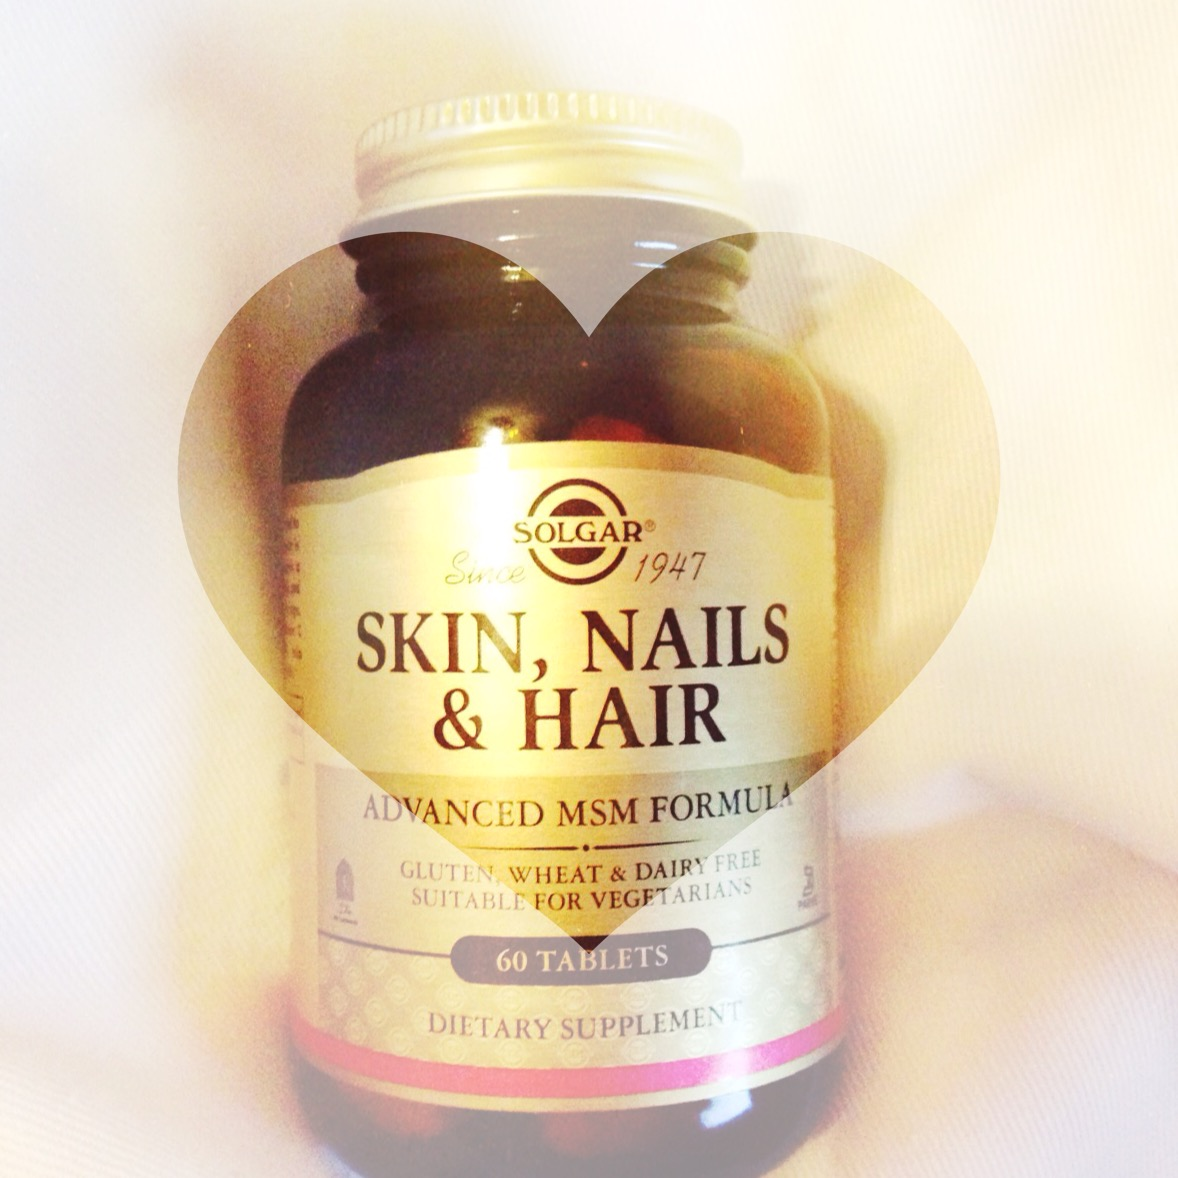 Solgar SKIN, NAILS & HAIR (1 400 руб. в Самсон-Фарме), 2  таблетки в день.